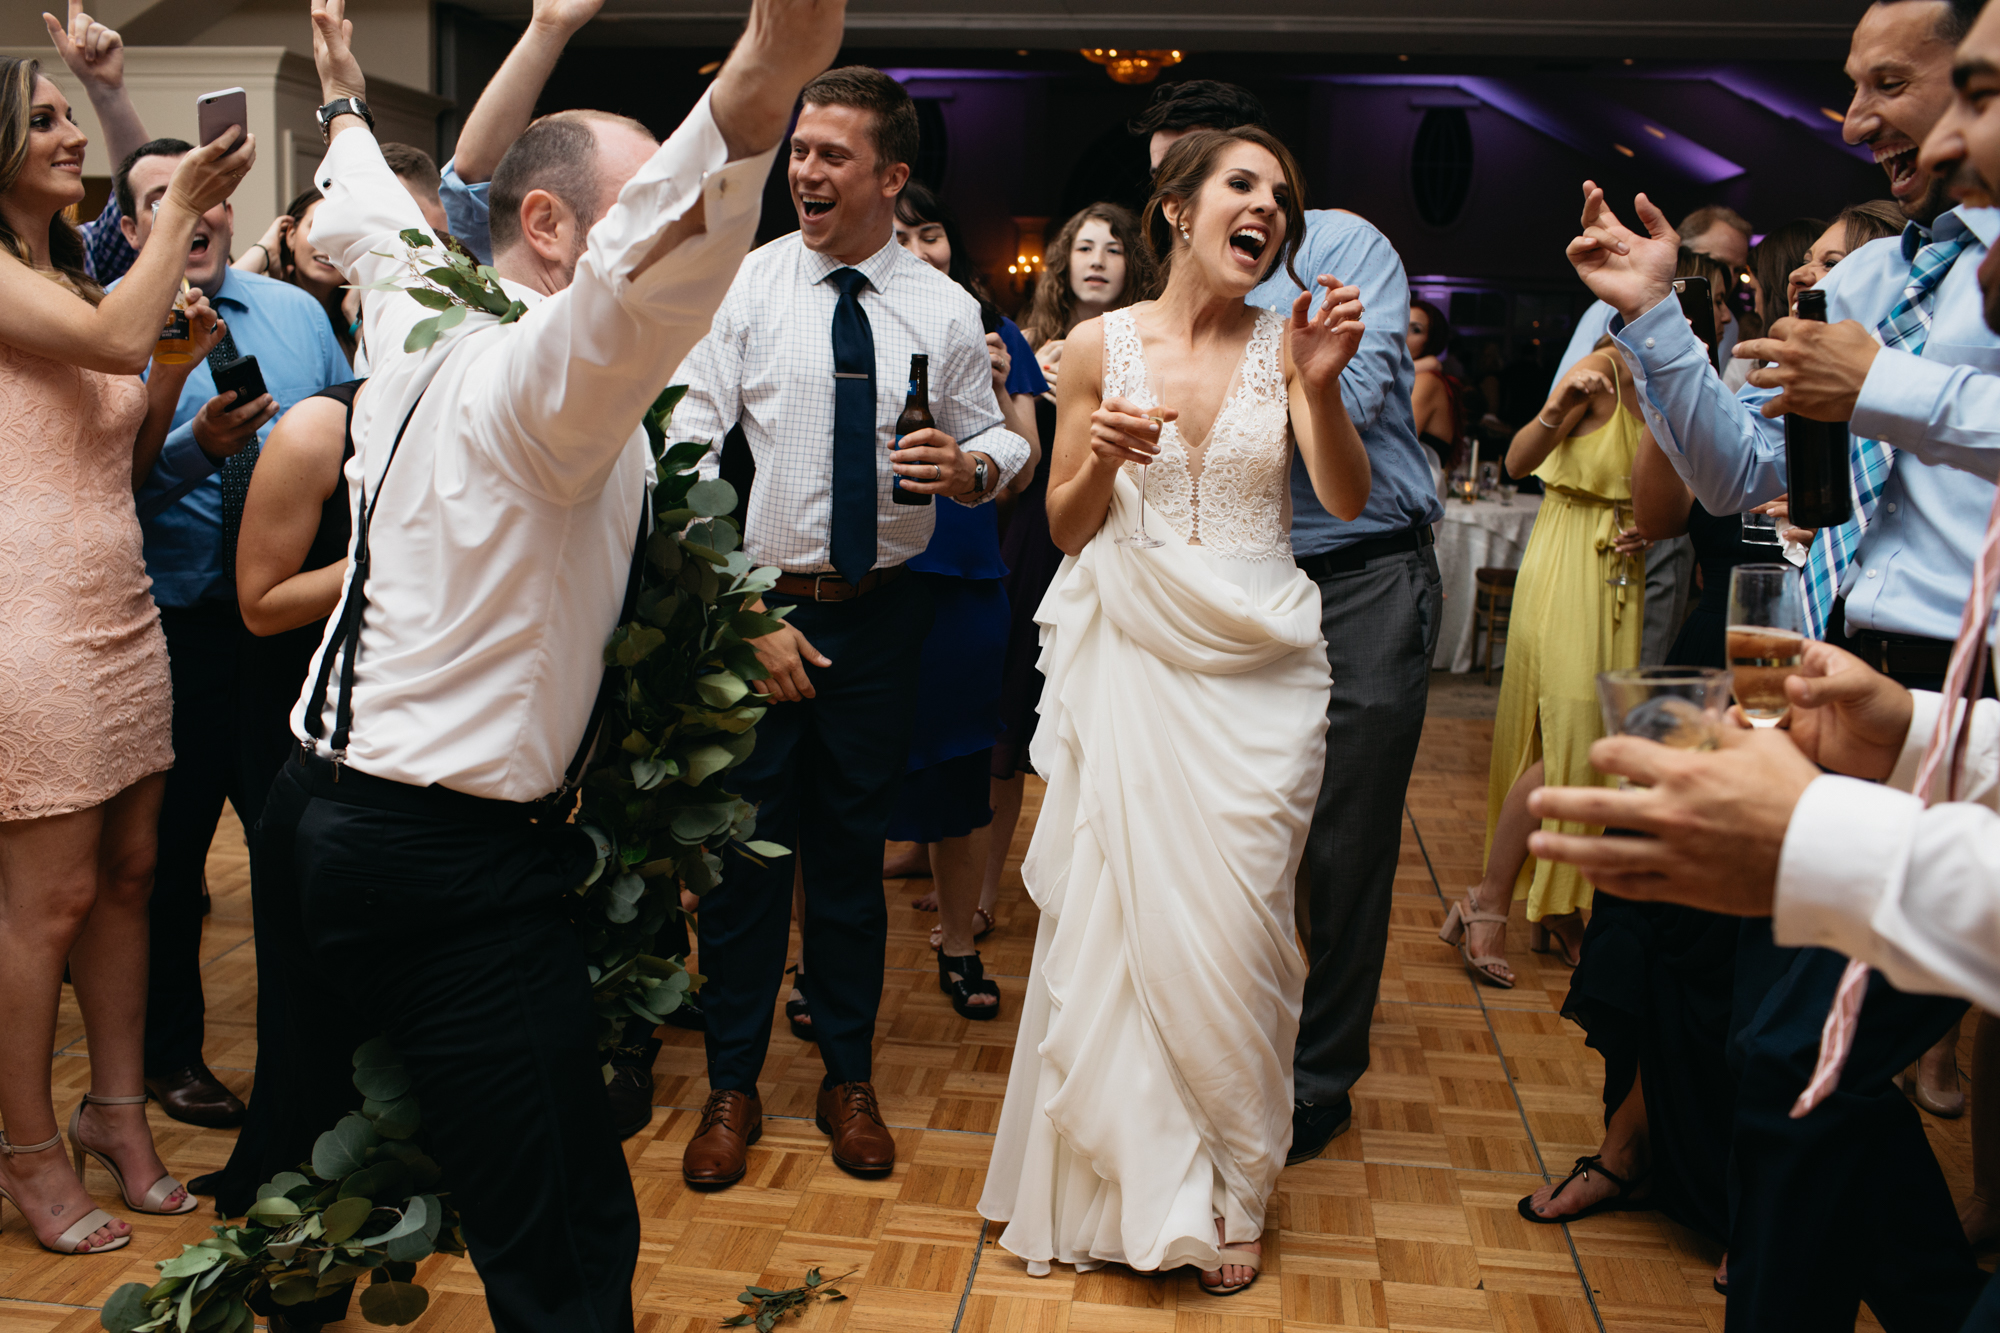 Jaclyn_Andrew_quincy_massachusetts_wedding035.jpg